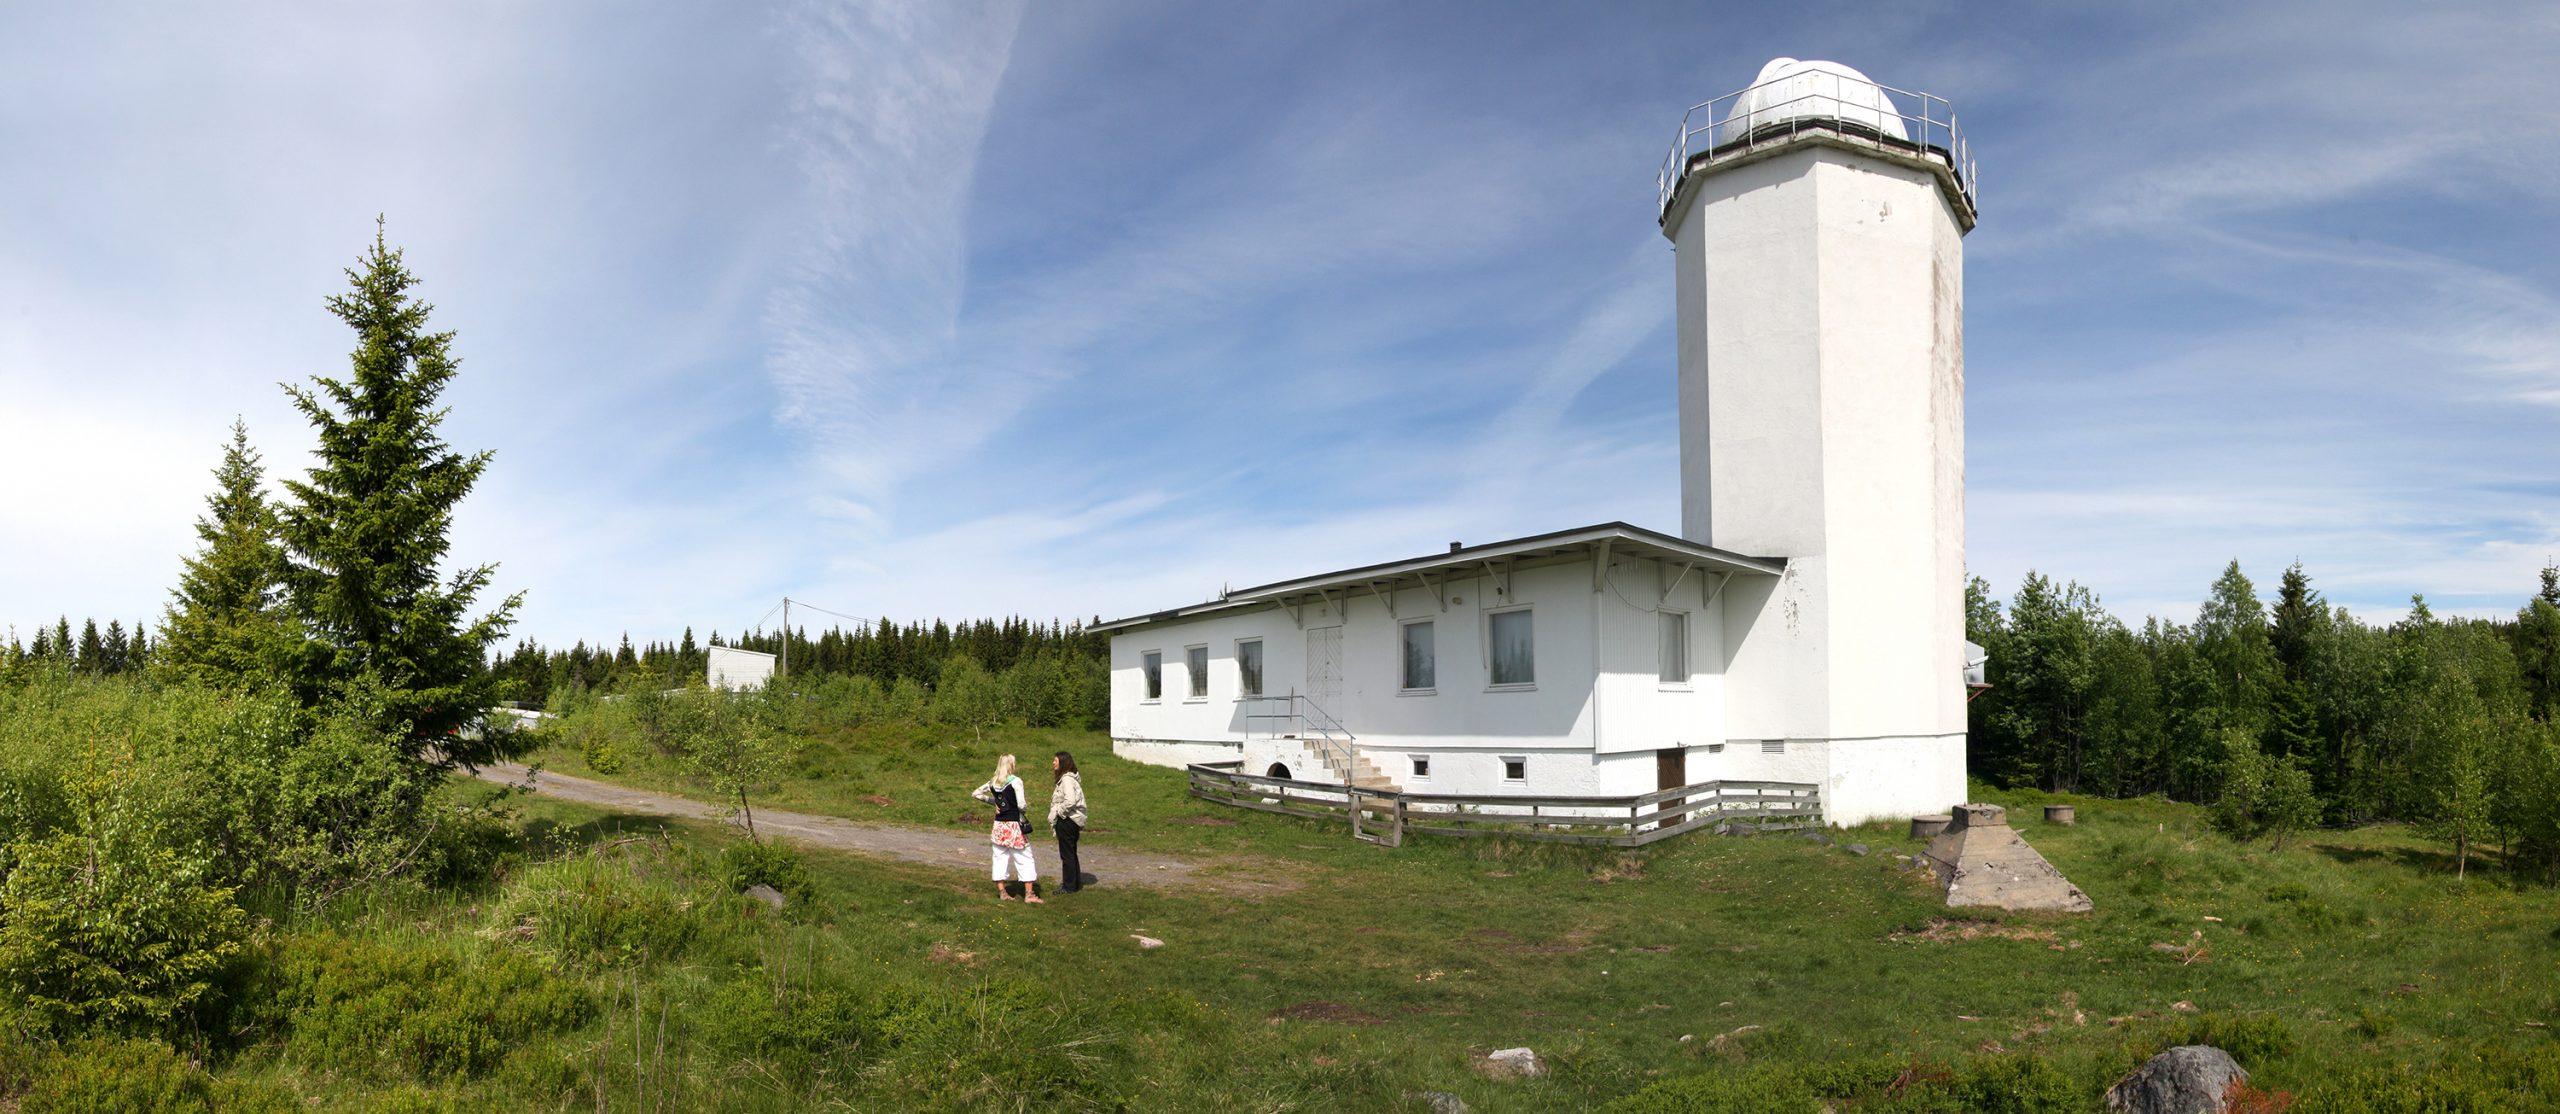 Bilde av Solobservatoriet. Foto: Snøhetta